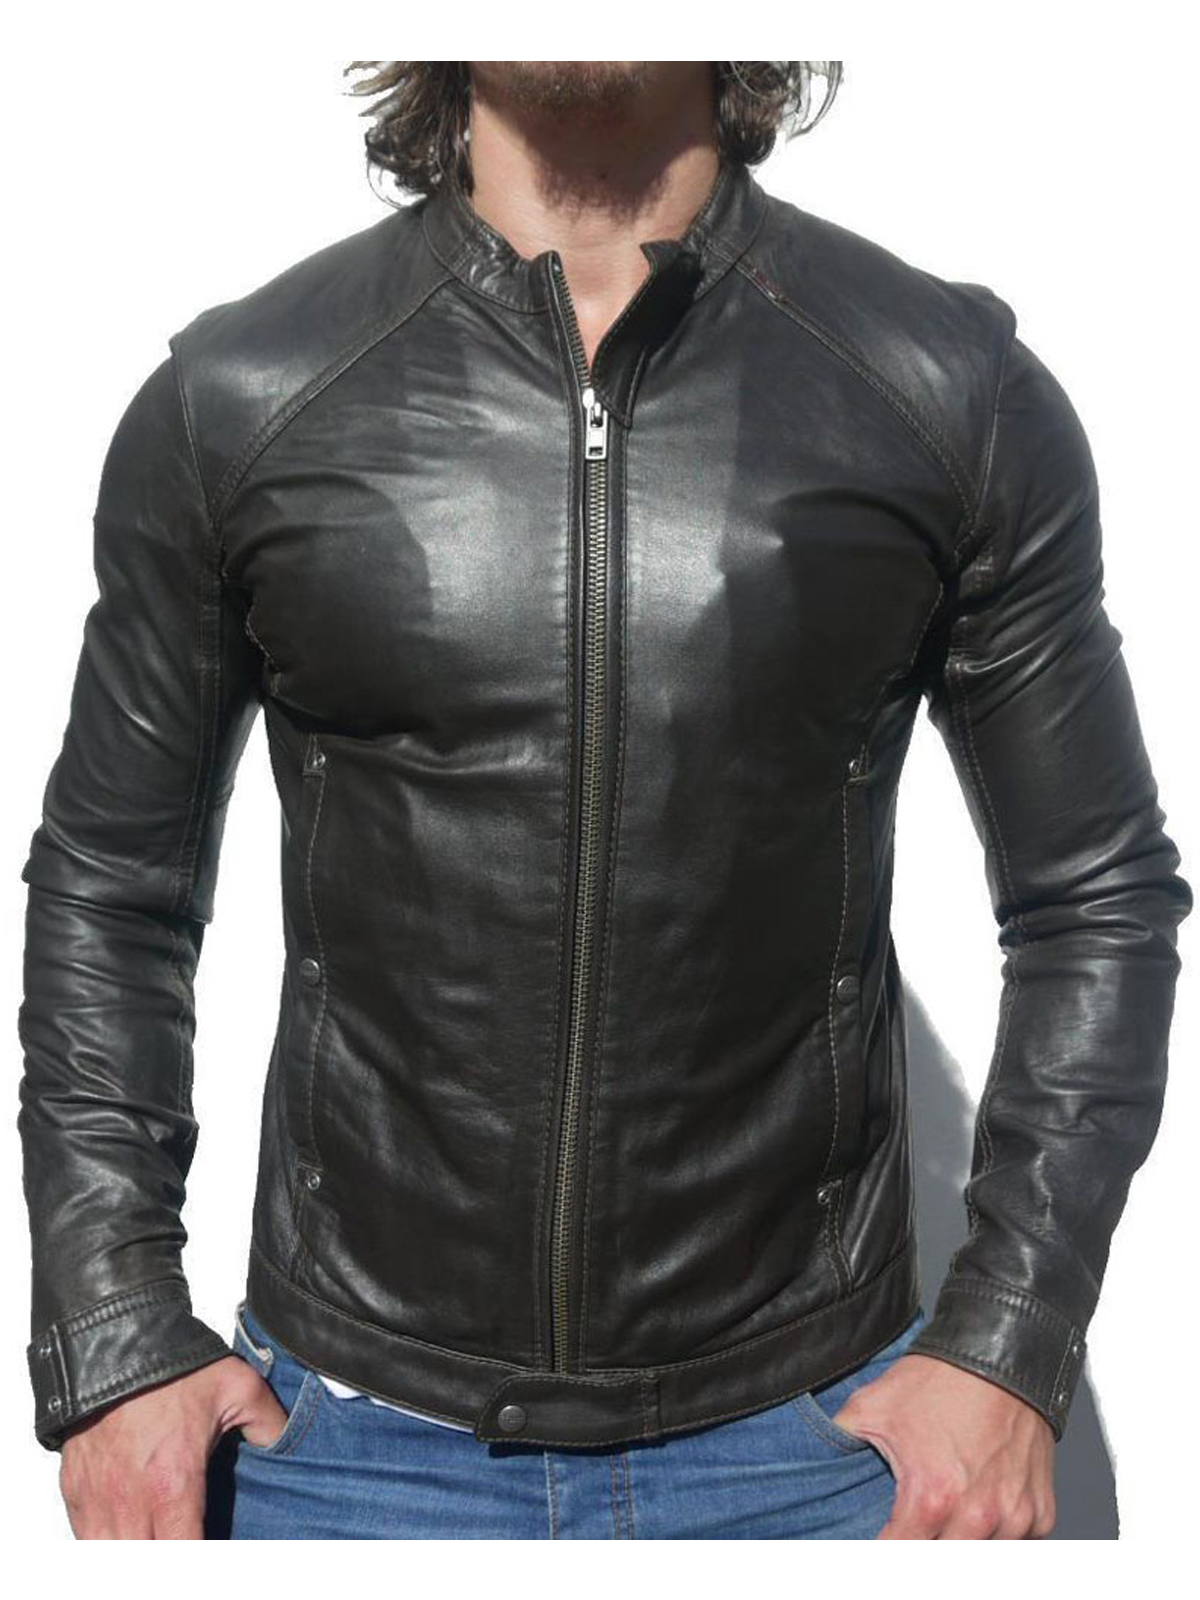 Limitless Bradley Cooper Biker Leather Jacket